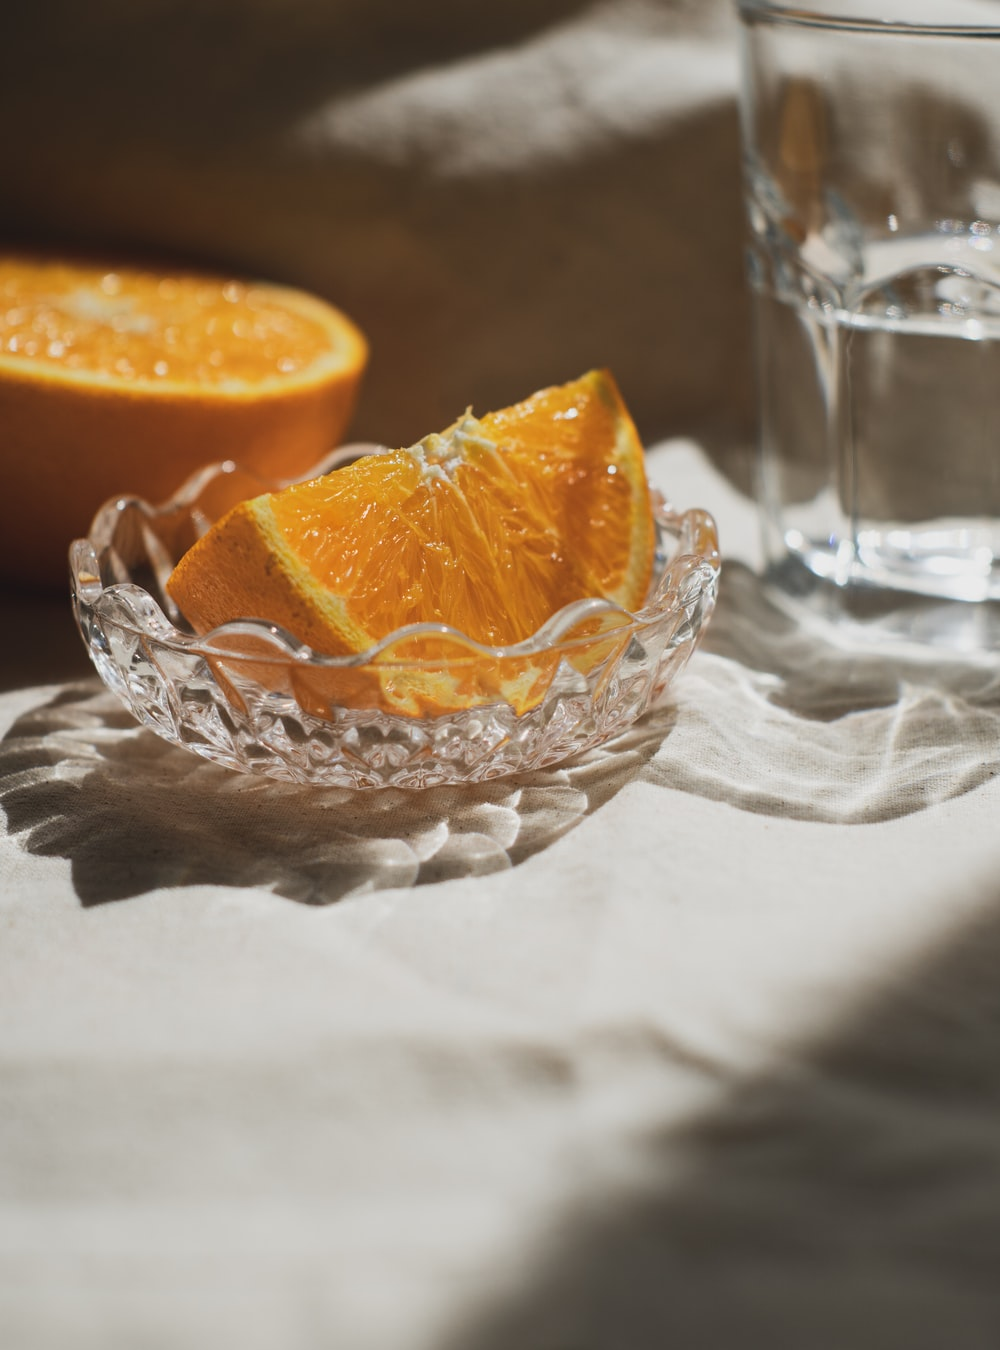 sliced orange fruit in clear cut glass bowl